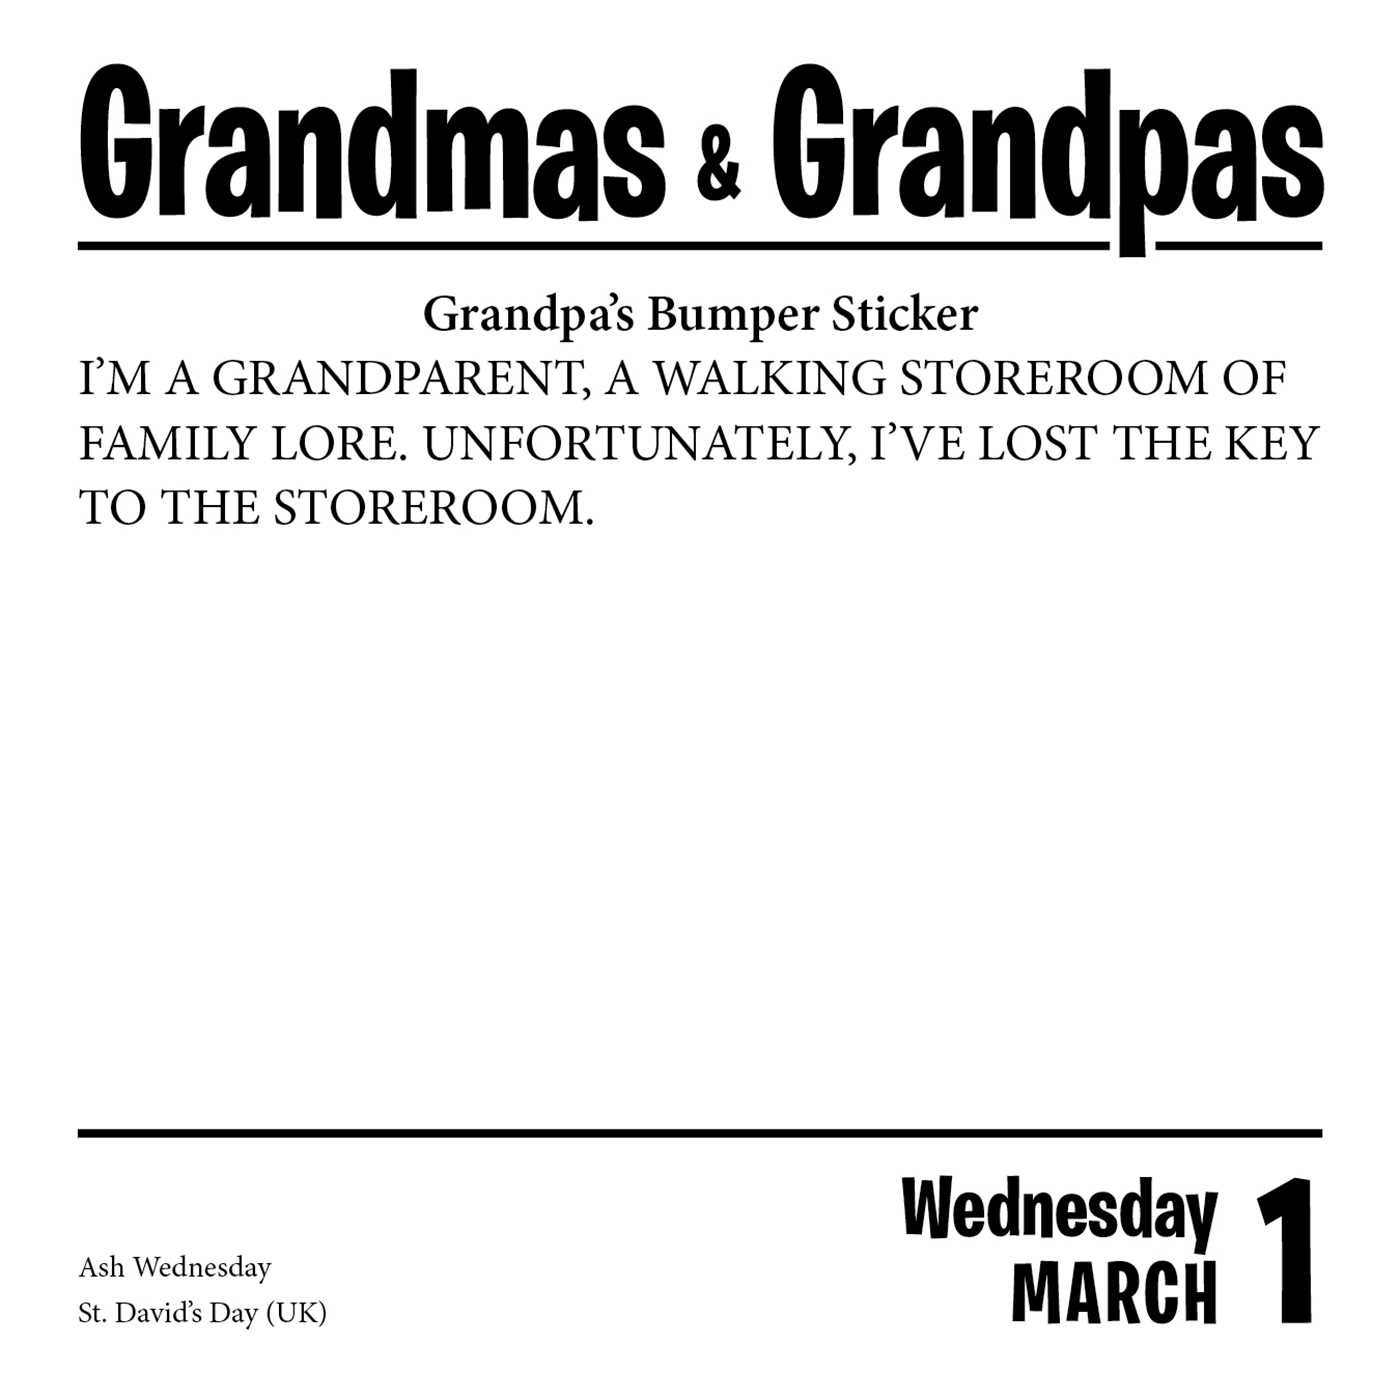 Grandmas grandpas 2017 day to day calendar kathryn zullo allan grandmas grandpas 2017 day to day calendar kathryn zullo allan zullo 9781449476847 amazon books fandeluxe Gallery